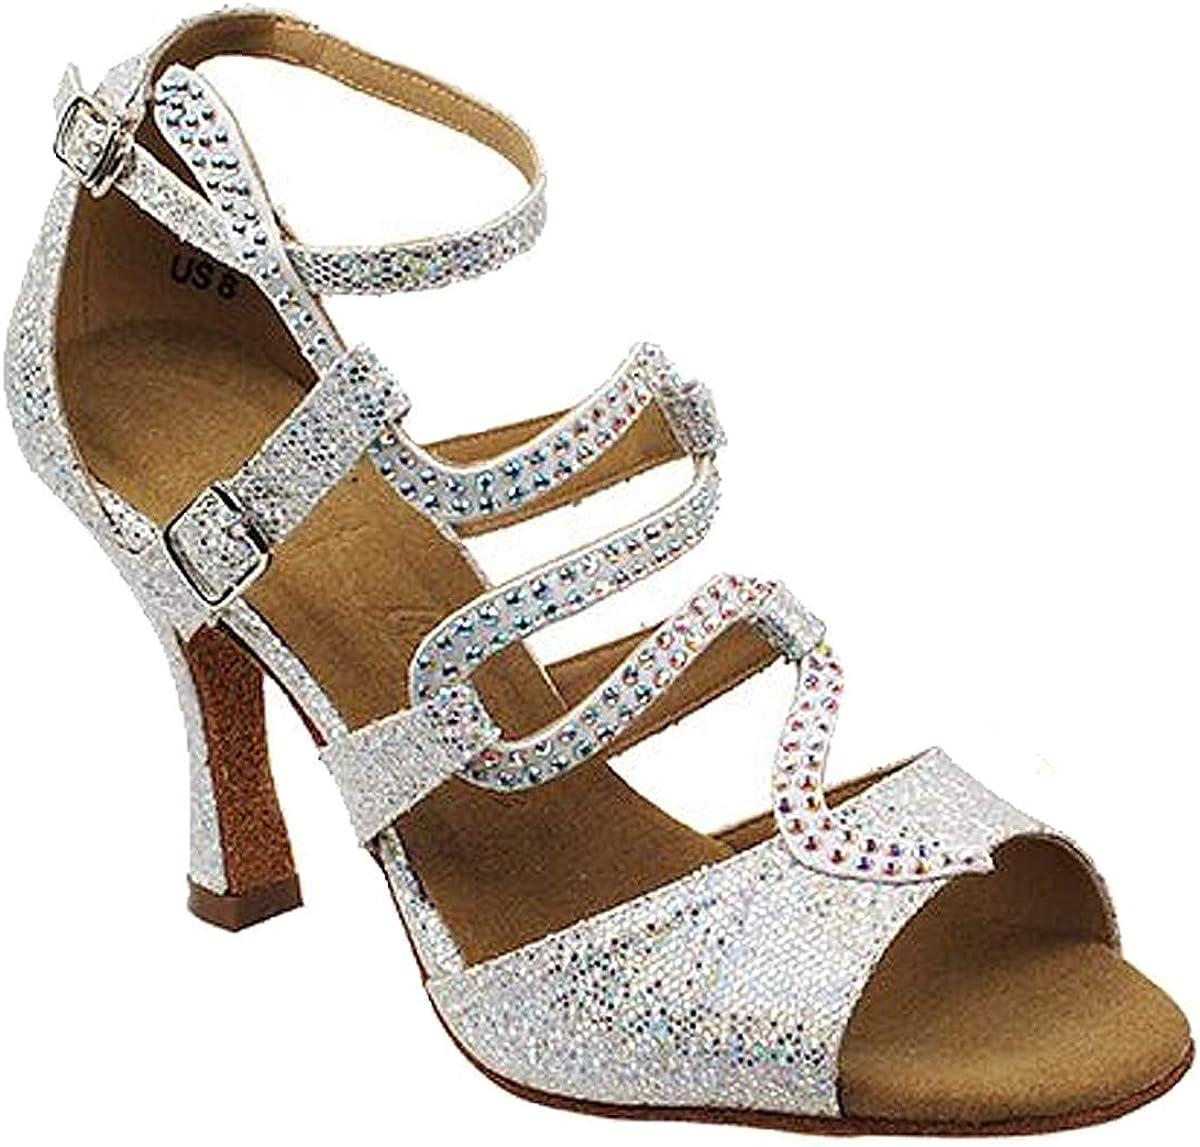 Women's Ballroom Dance Shoes Tango Wedding Salsa Shoes Sera7017EB Comfortable-Very Fine 3